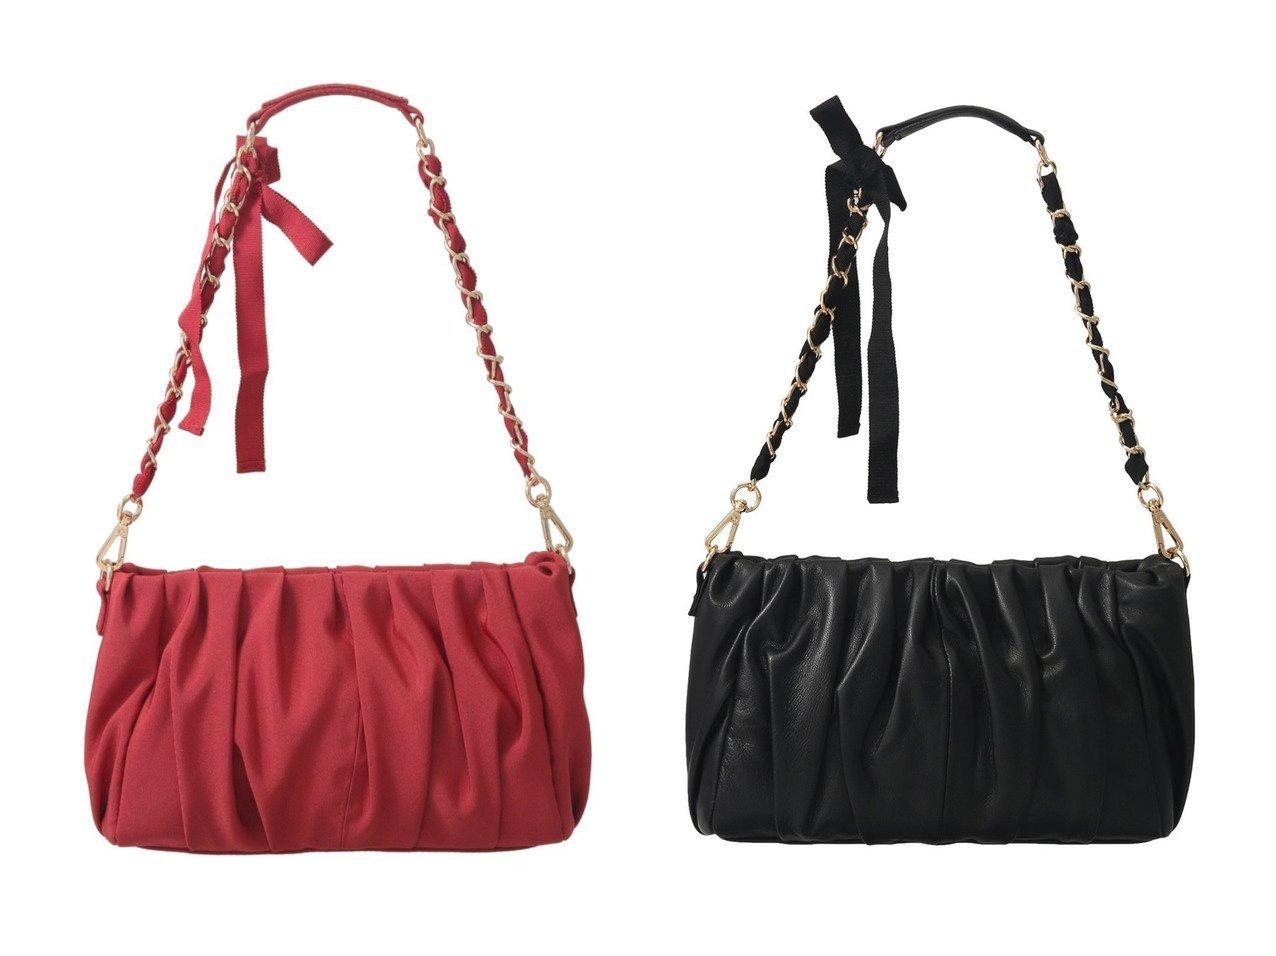 【LANVIN en Bleu/ランバン オン ブルー】のグログランギャザーハンドバッグ&レザーギャザーハンドバッグ バッグ・鞄のおすすめ!人気トレンド・レディースファッションの通販 おすすめで人気のファッション通販商品 インテリア・家具・キッズファッション・メンズファッション・レディースファッション・服の通販 founy(ファニー) https://founy.com/ ファッション Fashion レディース WOMEN バッグ Bag ギャザー グログラン ハンドバッグ フォルム なめらか アクセサリー チェーン パーティ リボン  ID:crp329100000006083